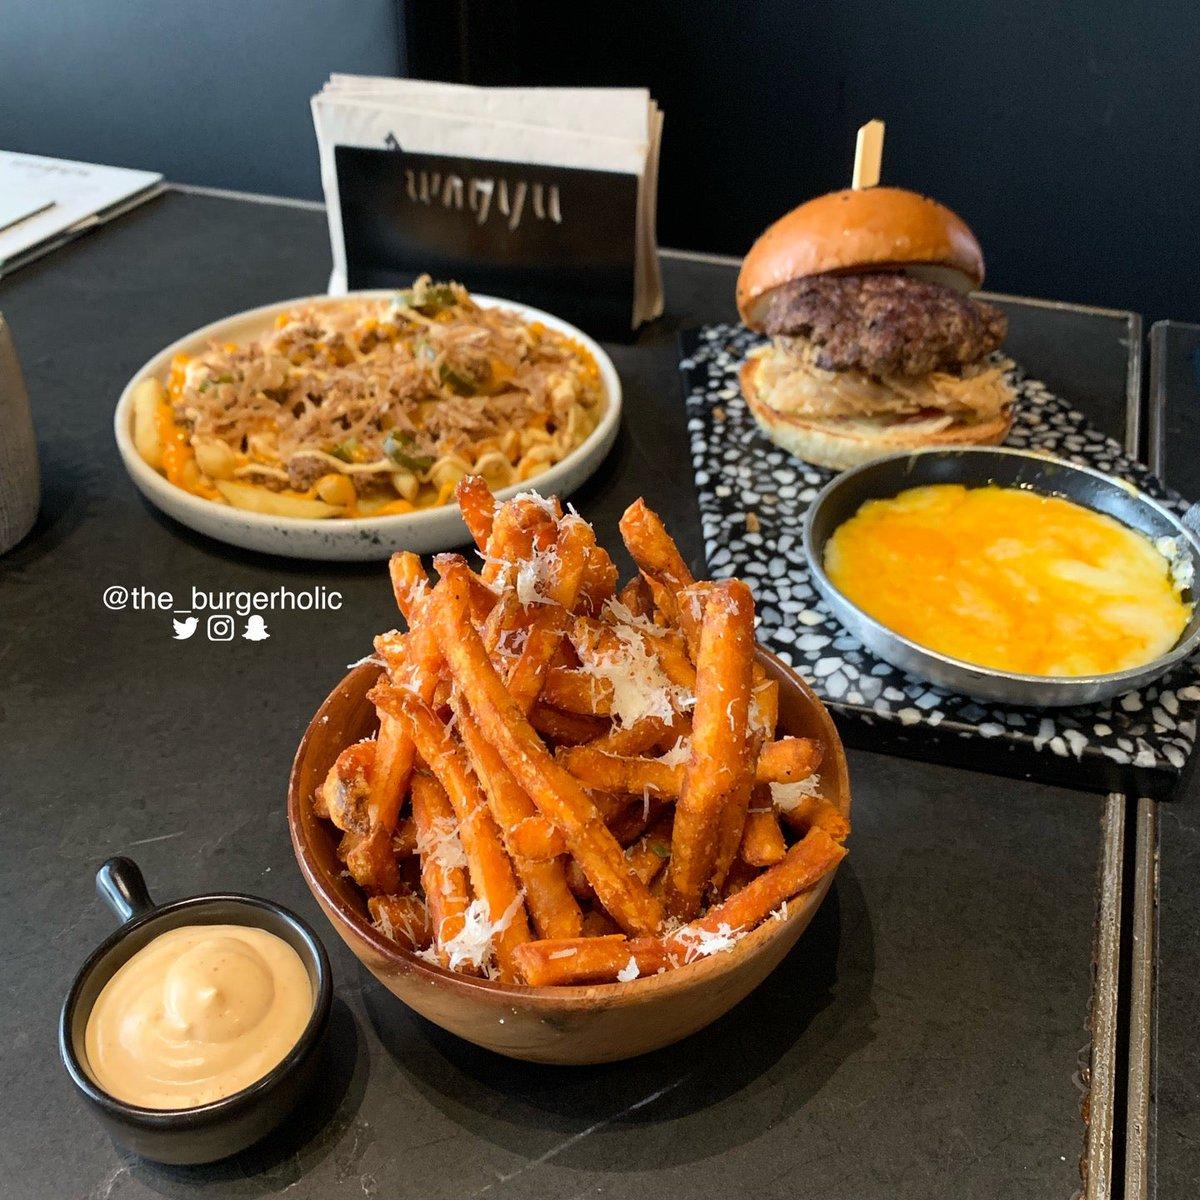 The Burgerholic On Twitter Wagyu Burger Wagyu Burger The Elite In Riyadh Https T Co 91fgcbmvnb